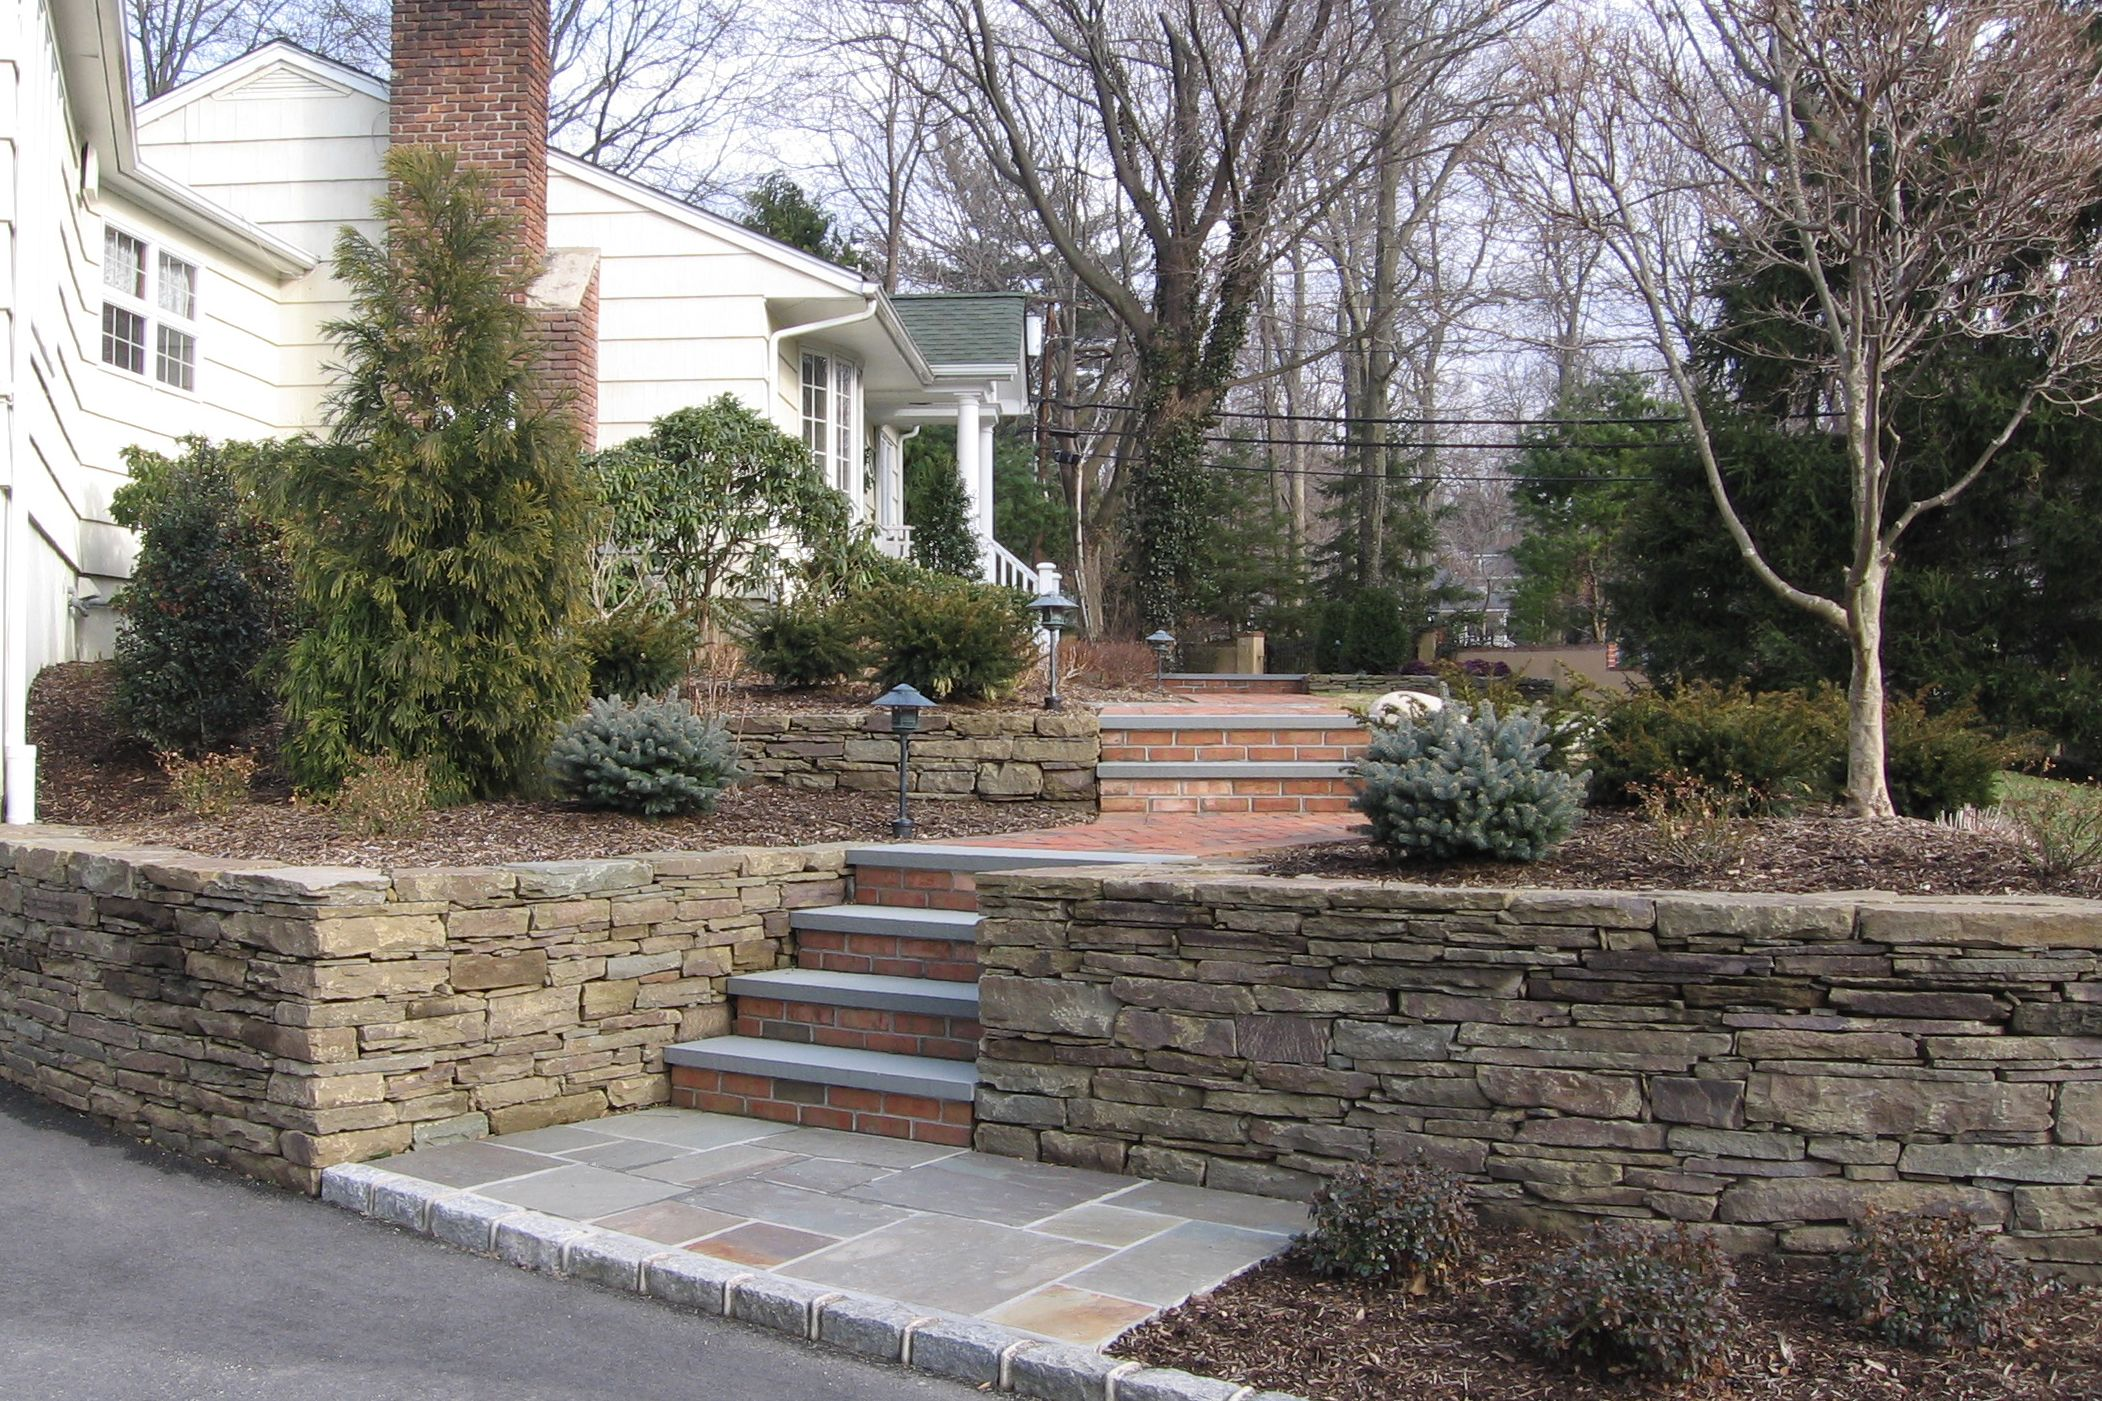 Stone Retaining Walls With Brick And Bluestone Steps Mainstreetnursery Stonewalls Retainingwalls Porch Stairs Exterior Stairs